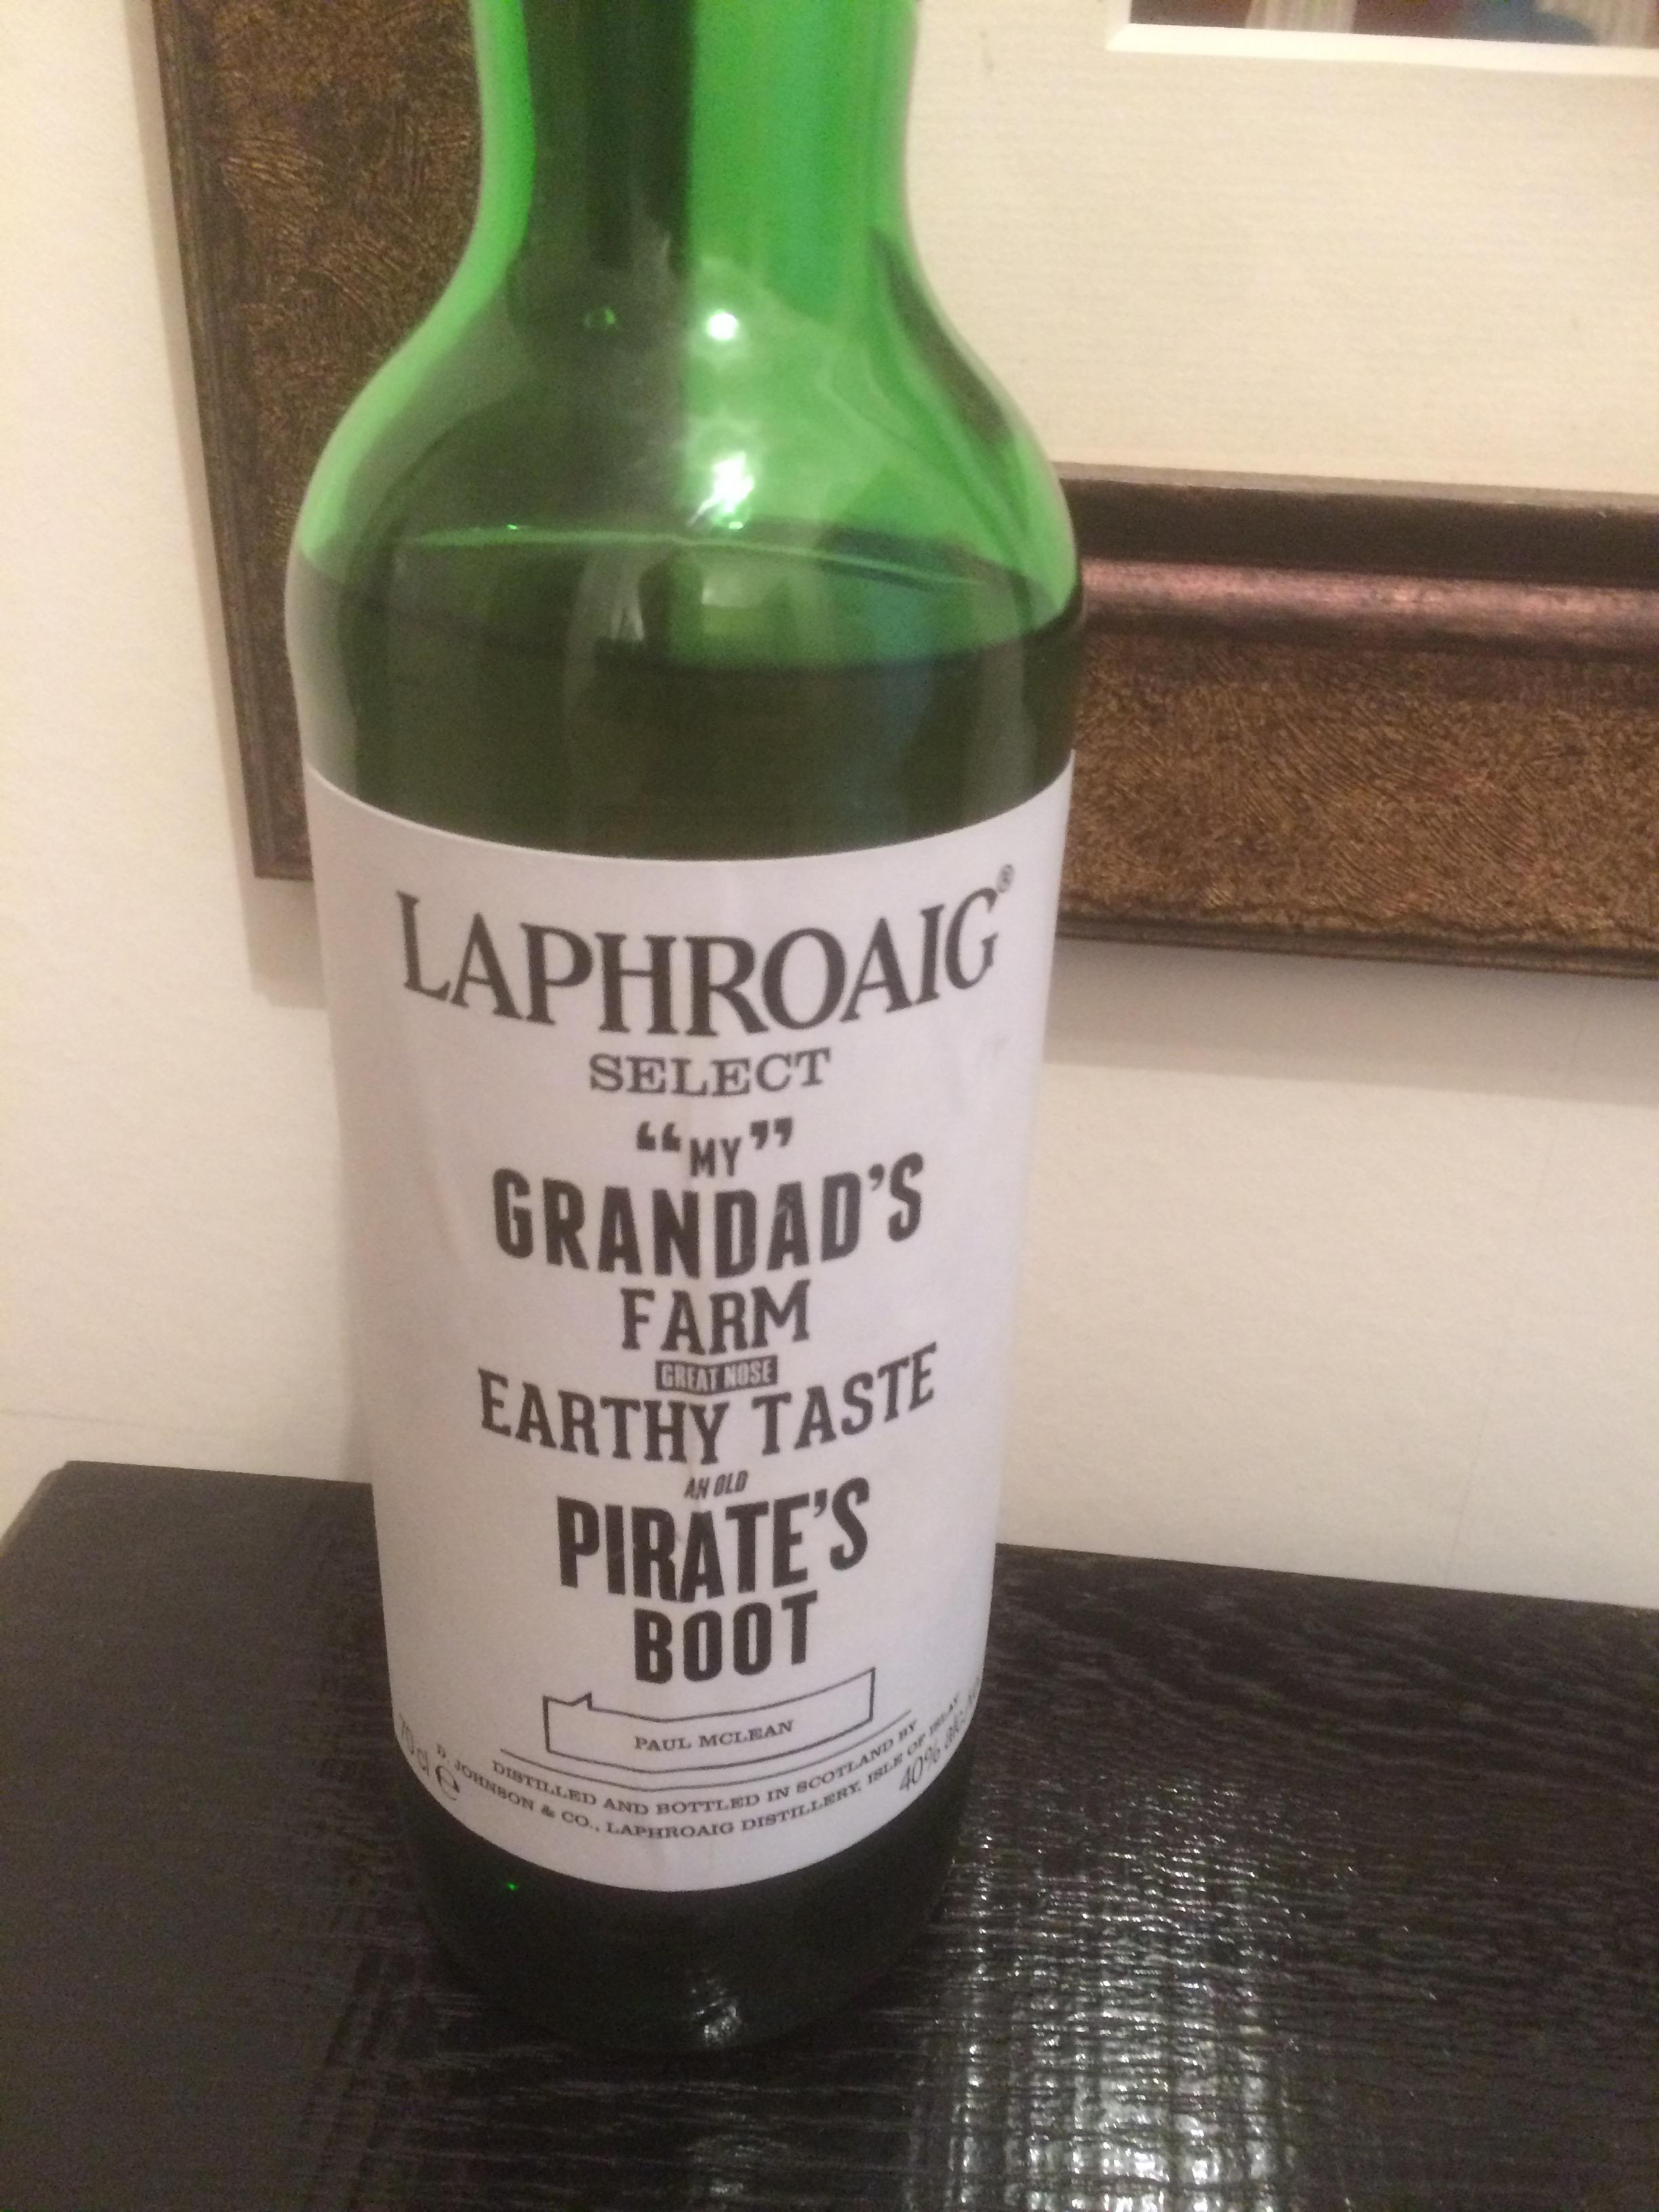 Bottle of Laphroig